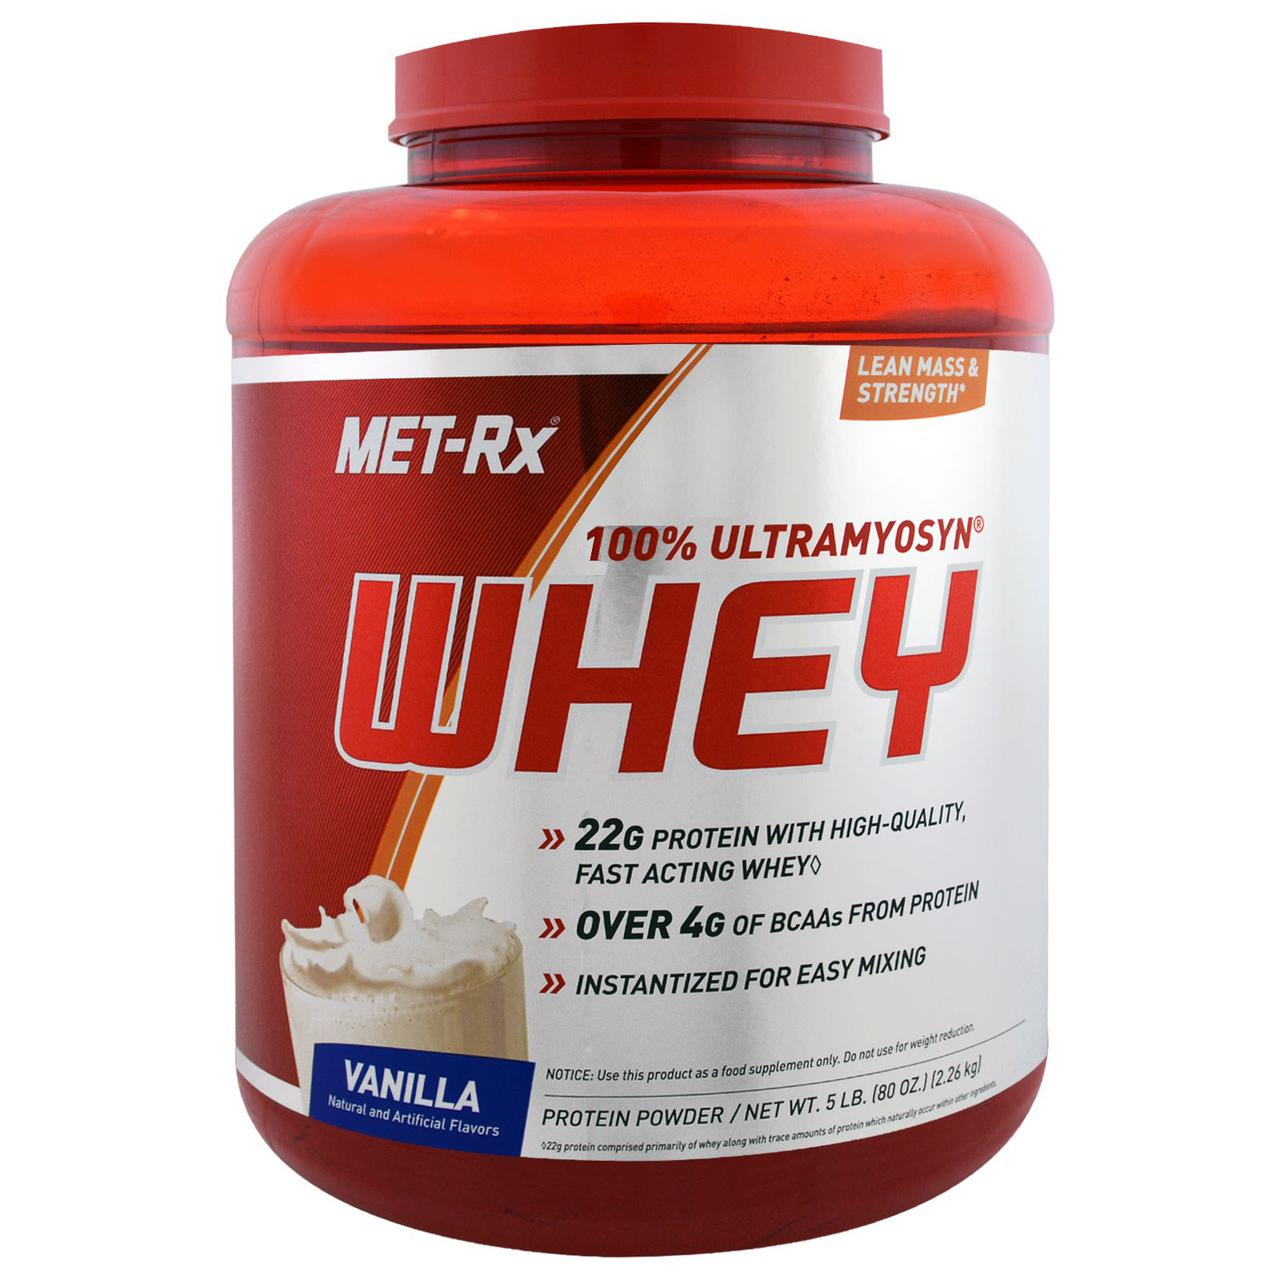 MET-Rx, Сыворотка со 100% Ultramyosyn, ваниль, 80 унций (2,26 кг)